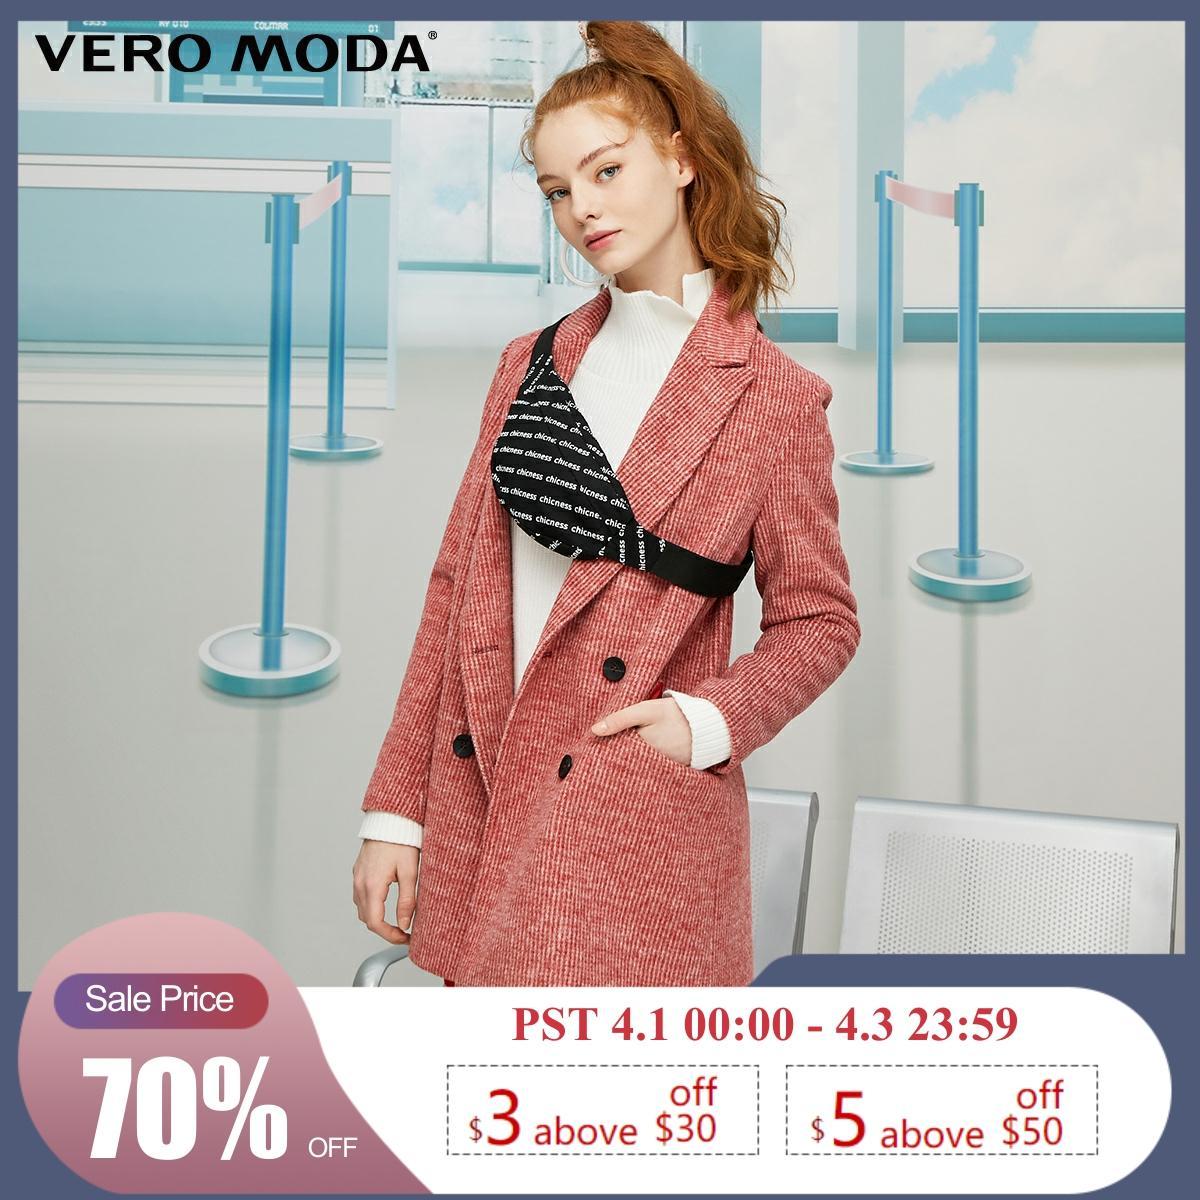 Vero Moda New Vintage Women's Lapel Double-breasted Blazer Suit Jacket | 319308589